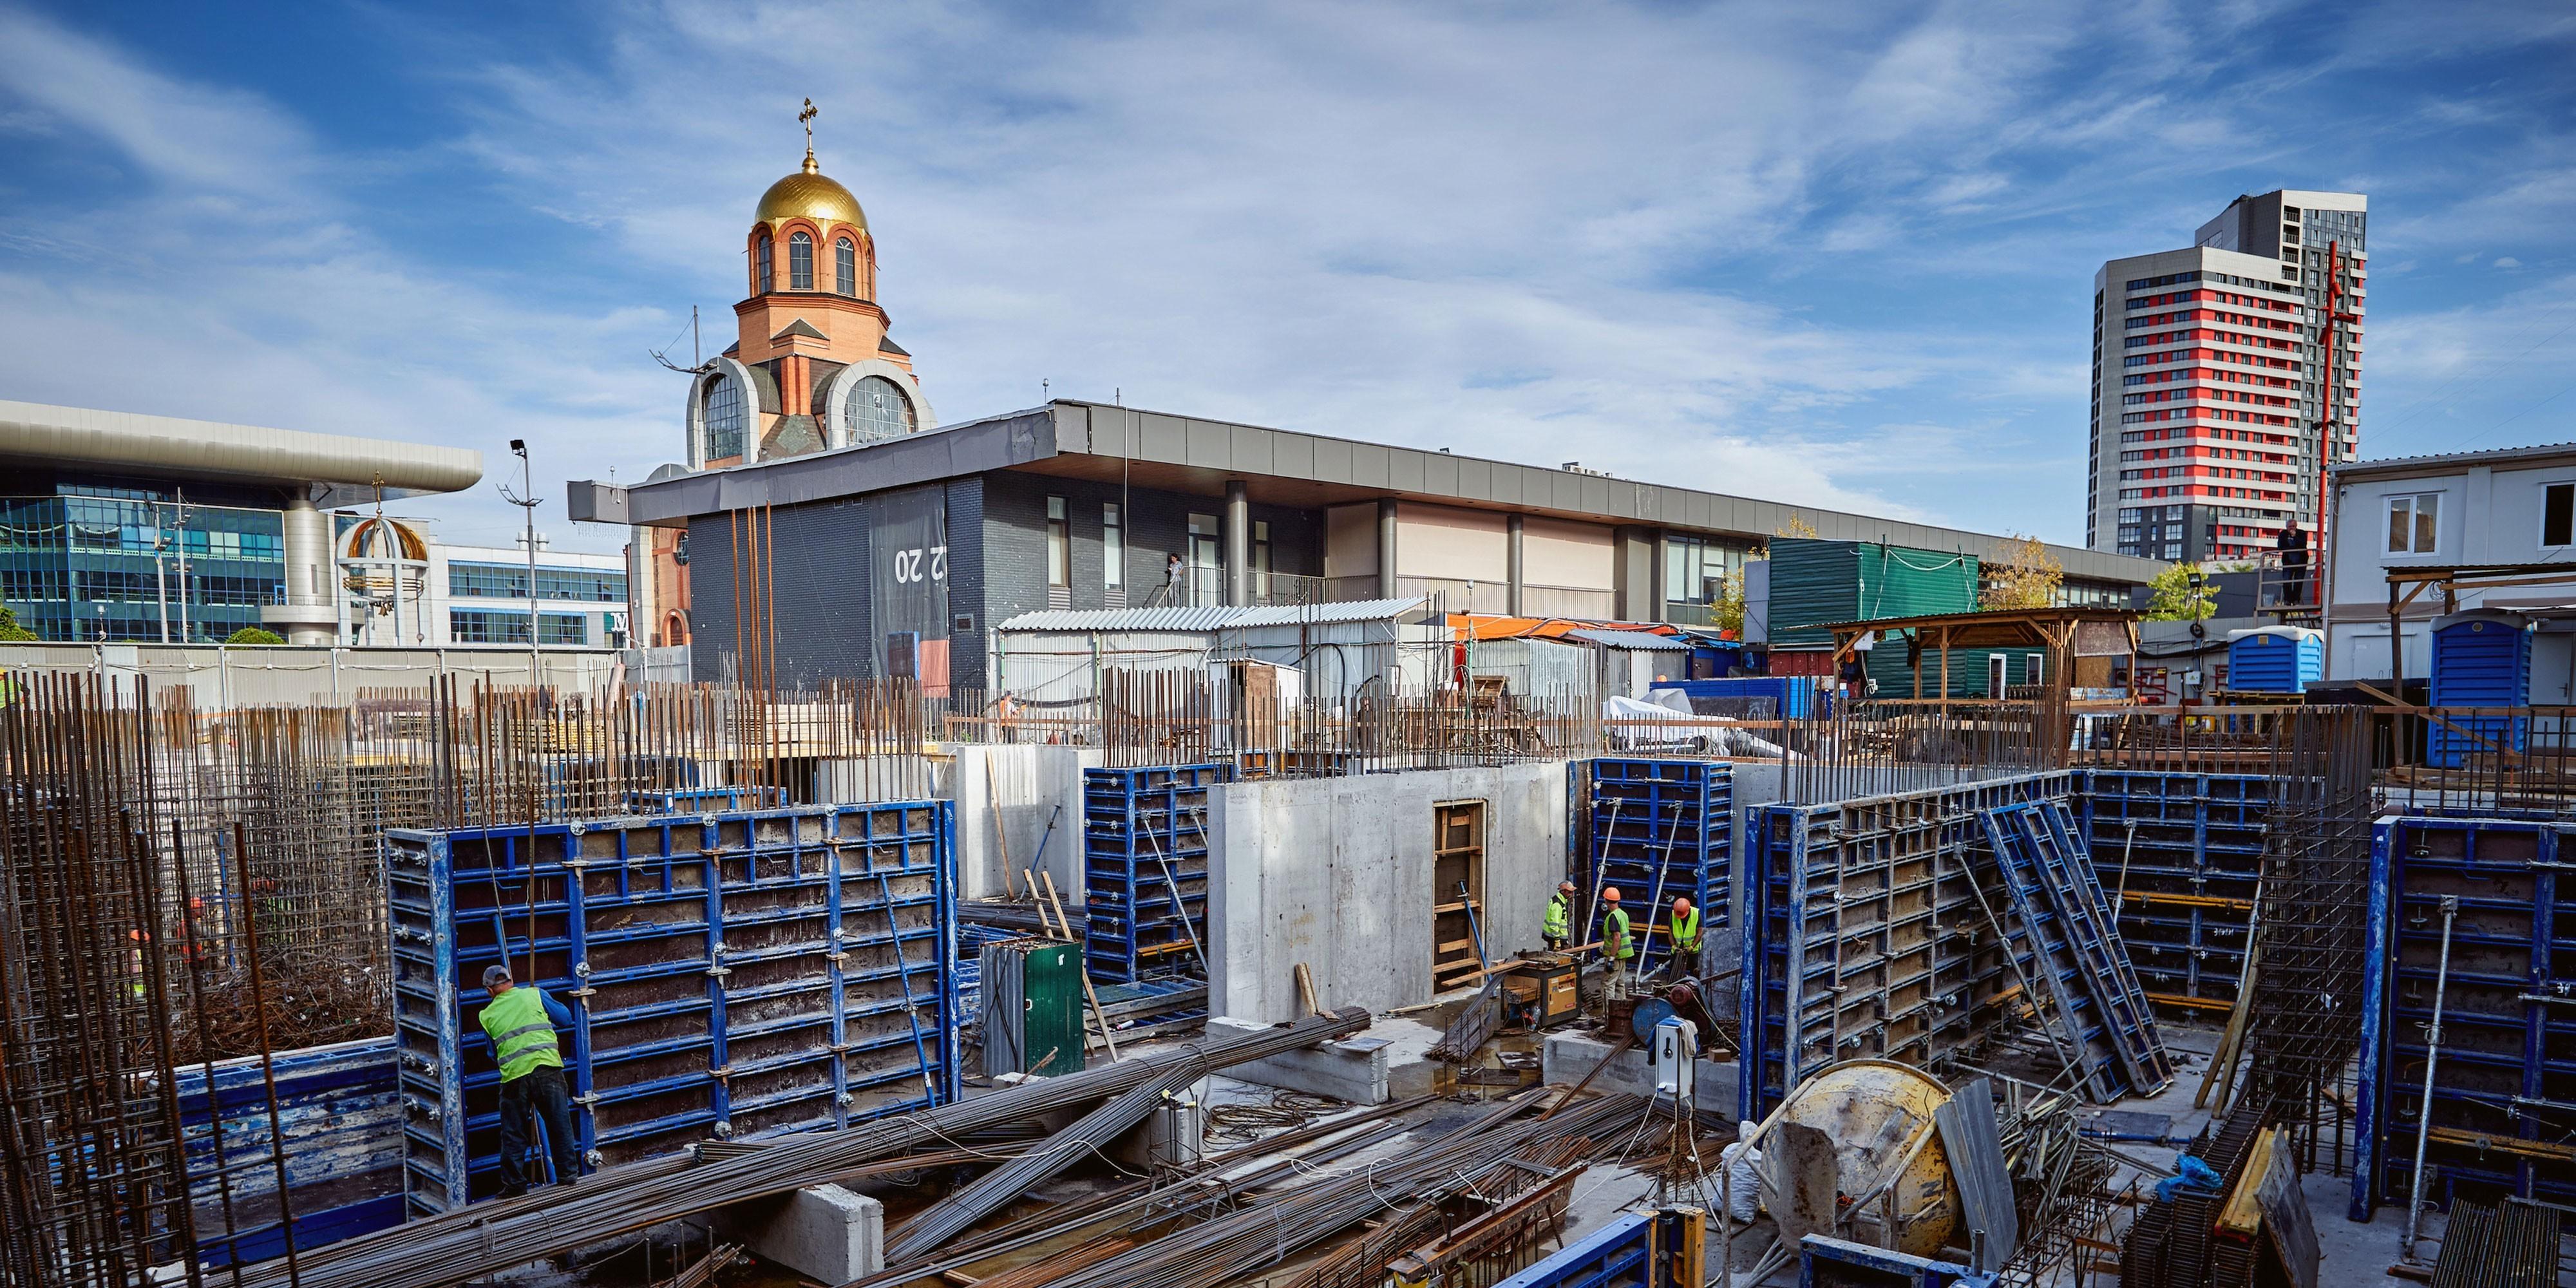 Construction progress of S1 TERMINAL. September 2020